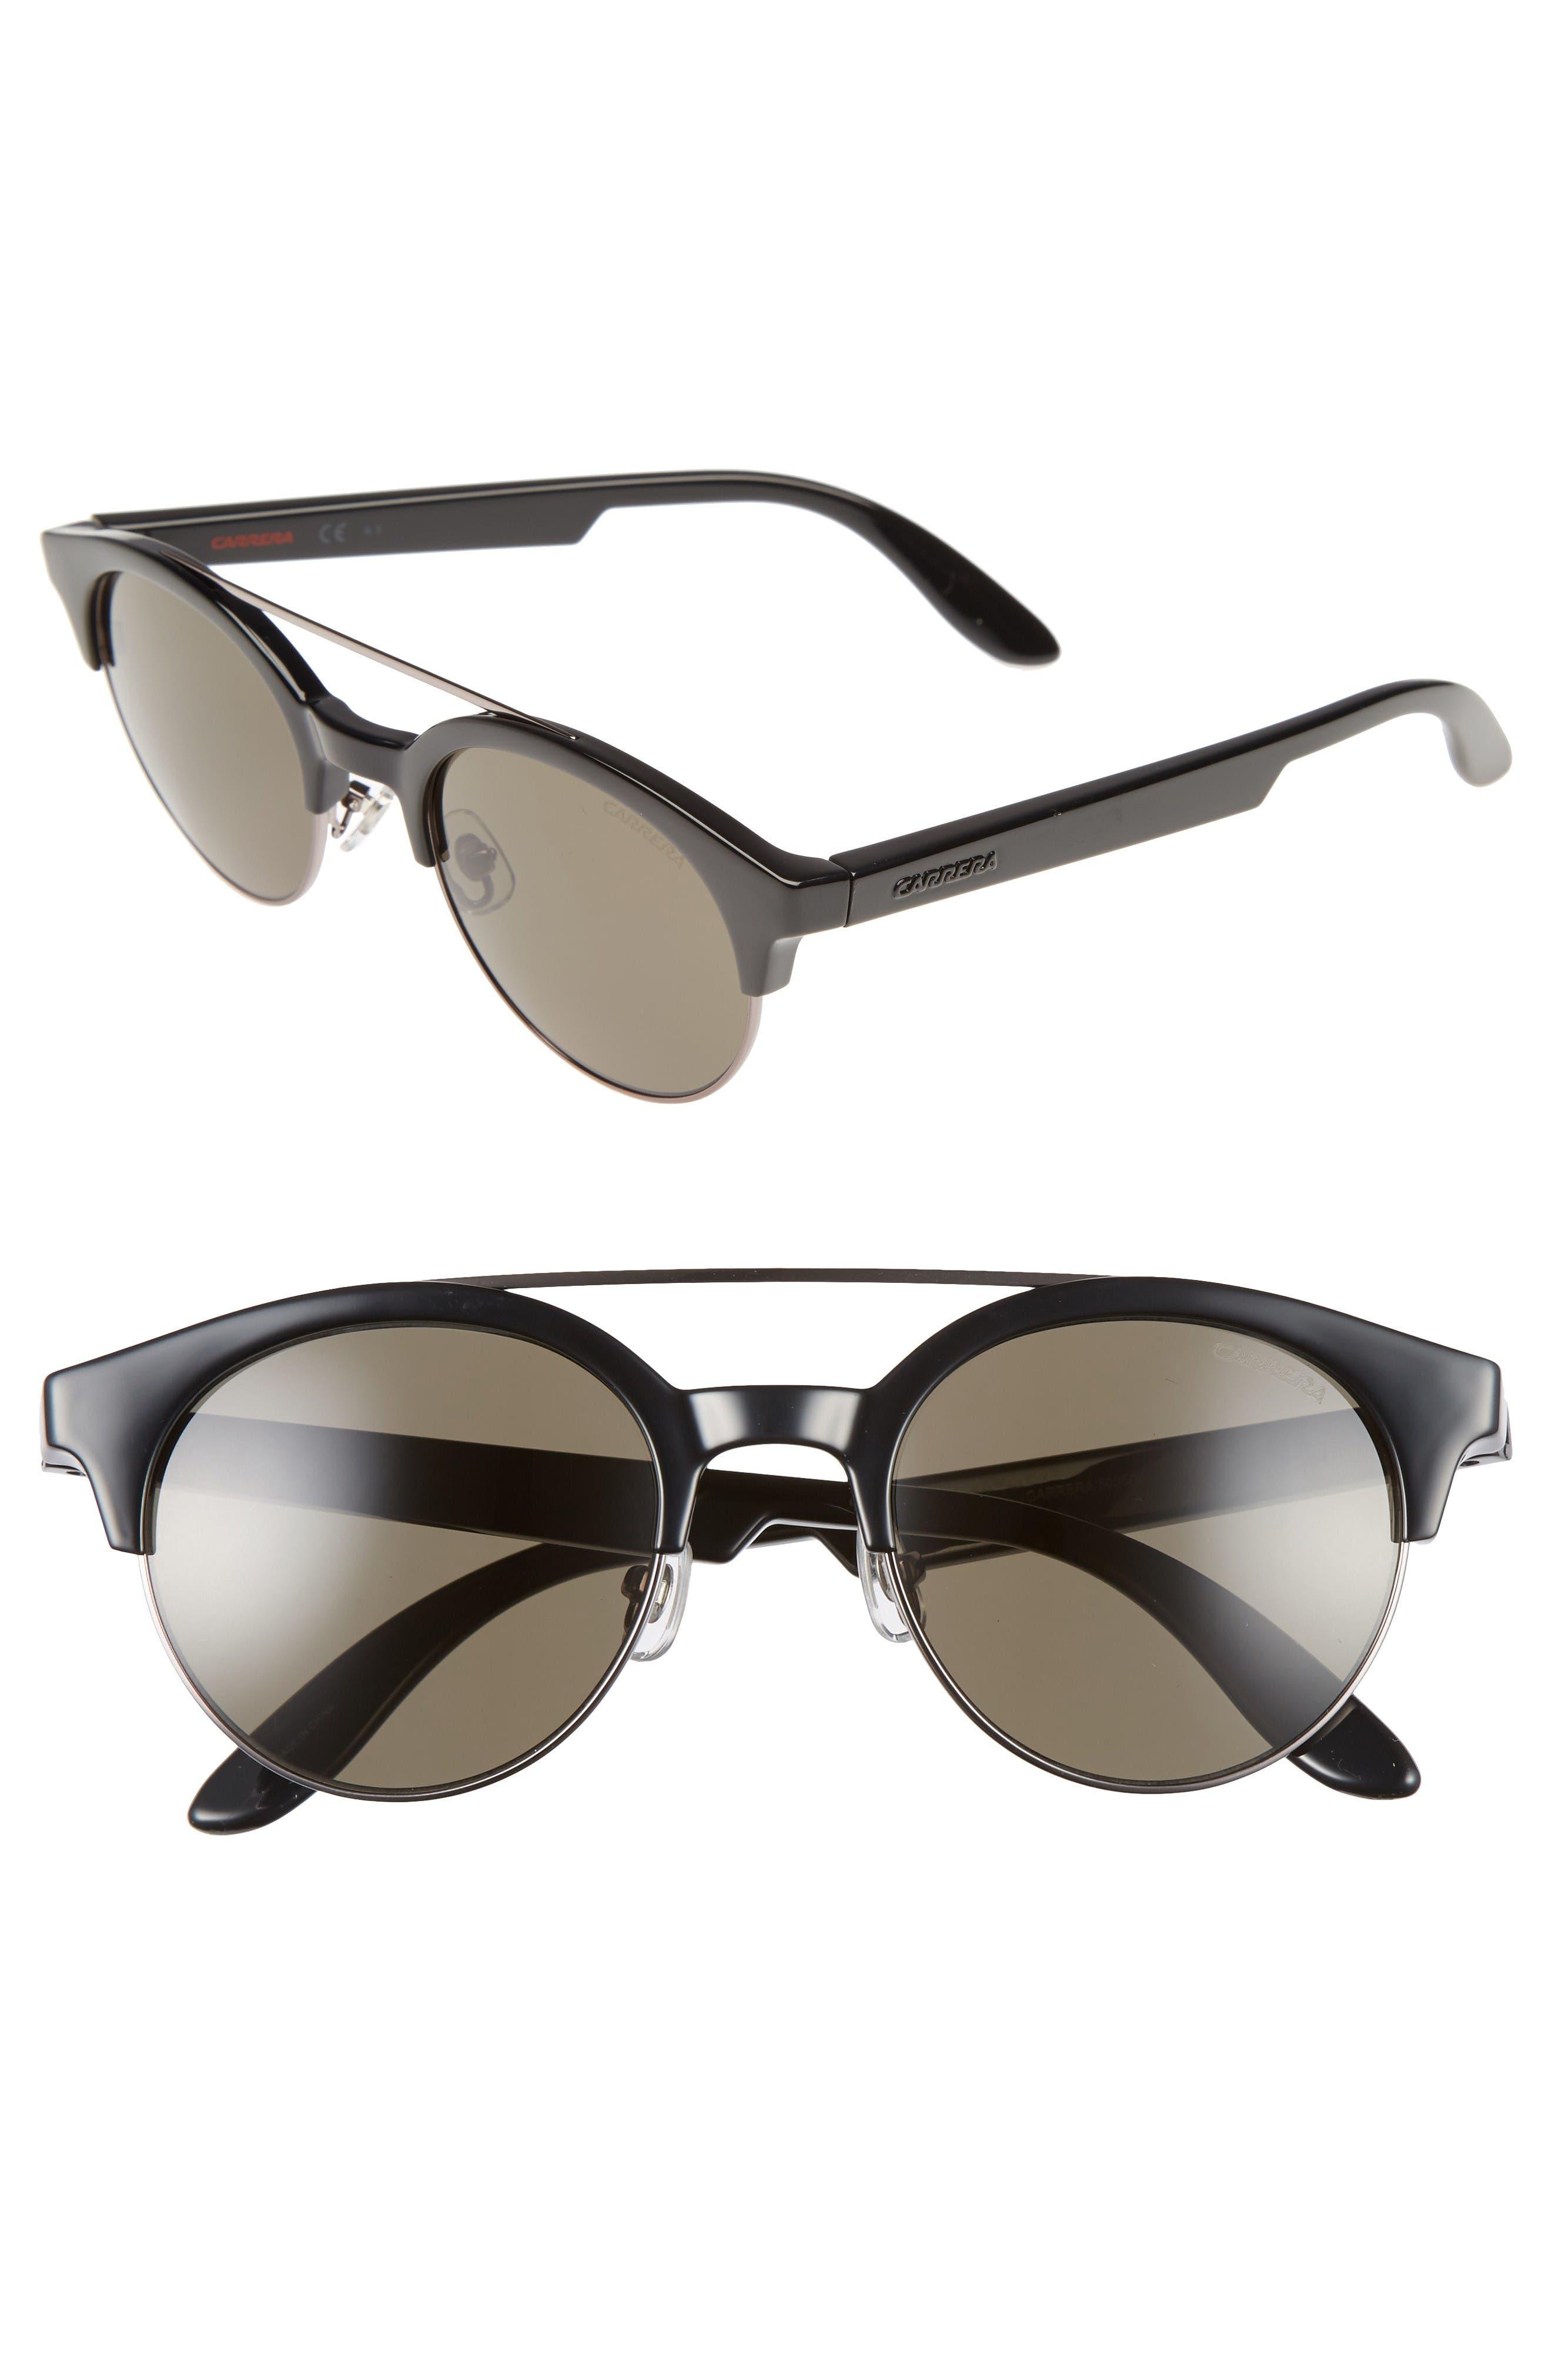 Main Image - Carrera Eyewear Retro 50mm Sunglasses